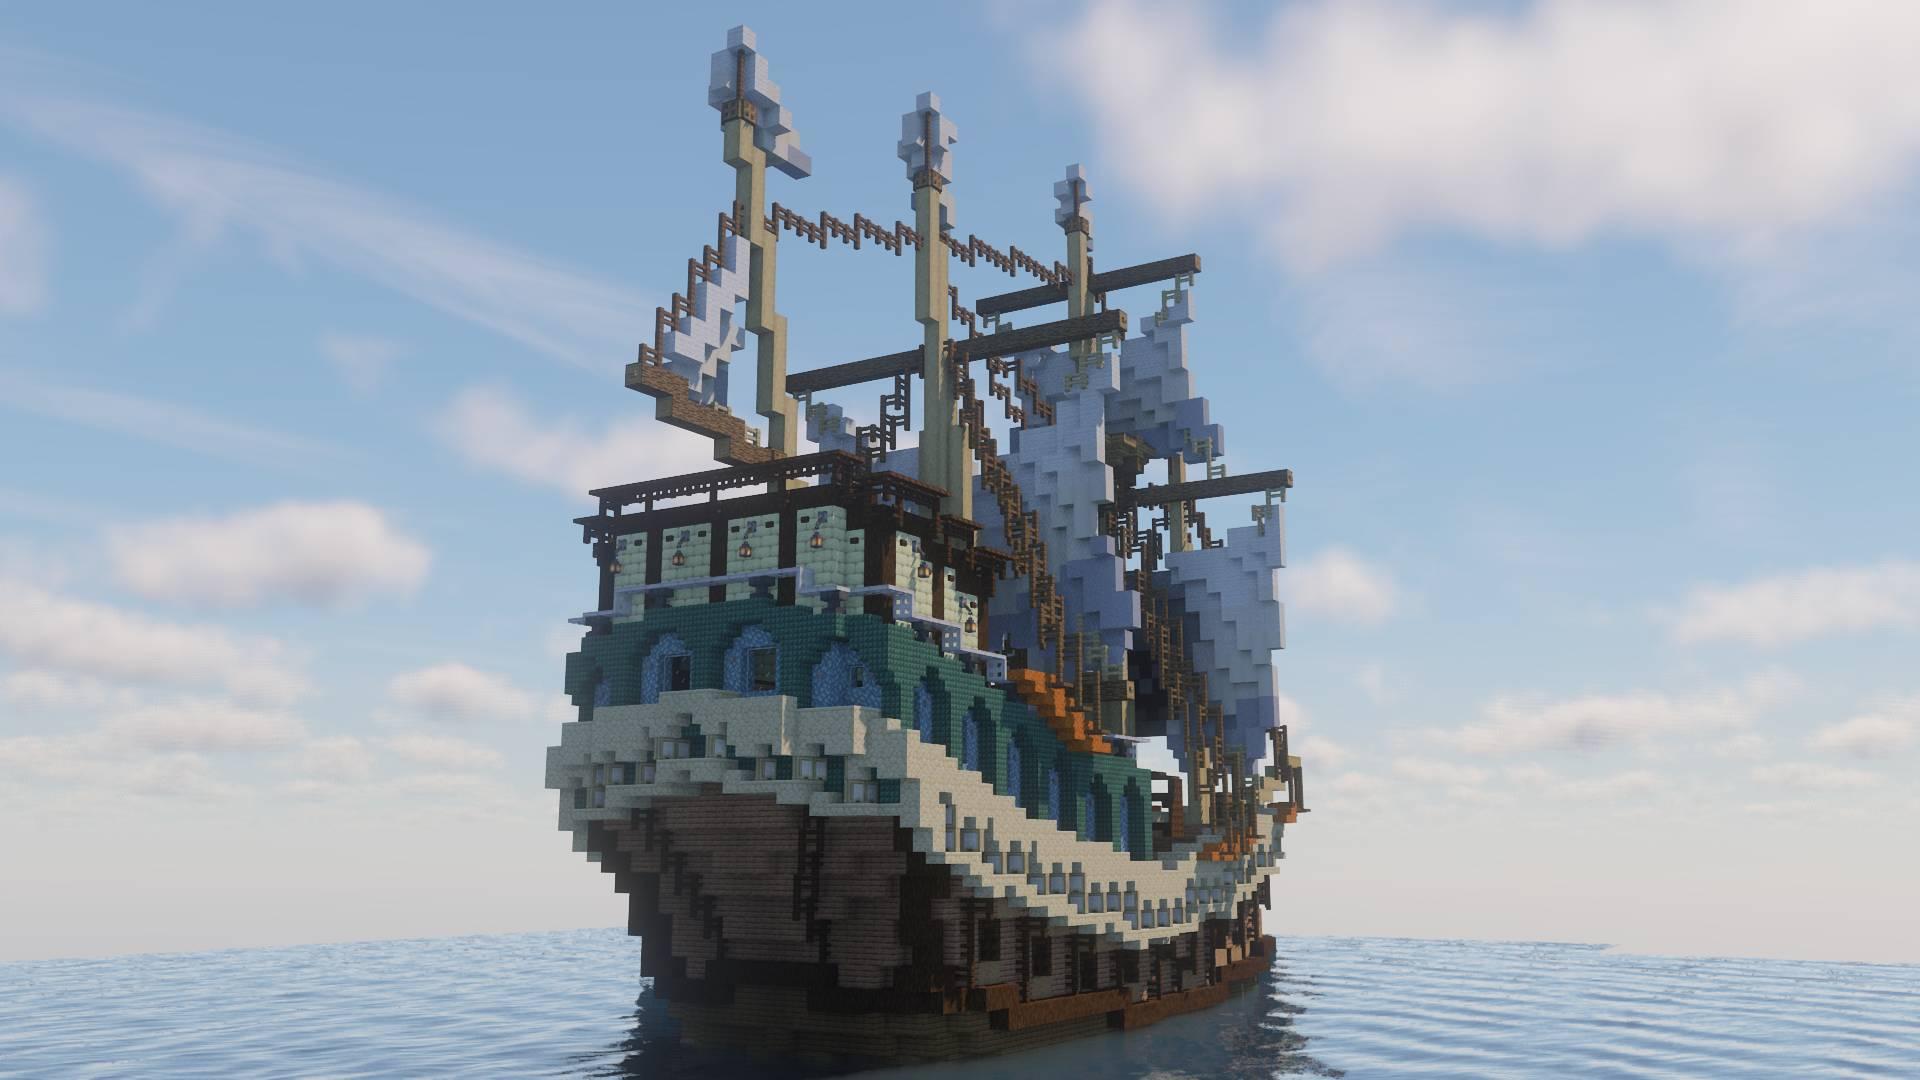 Hijacked Spanish Galleon 6